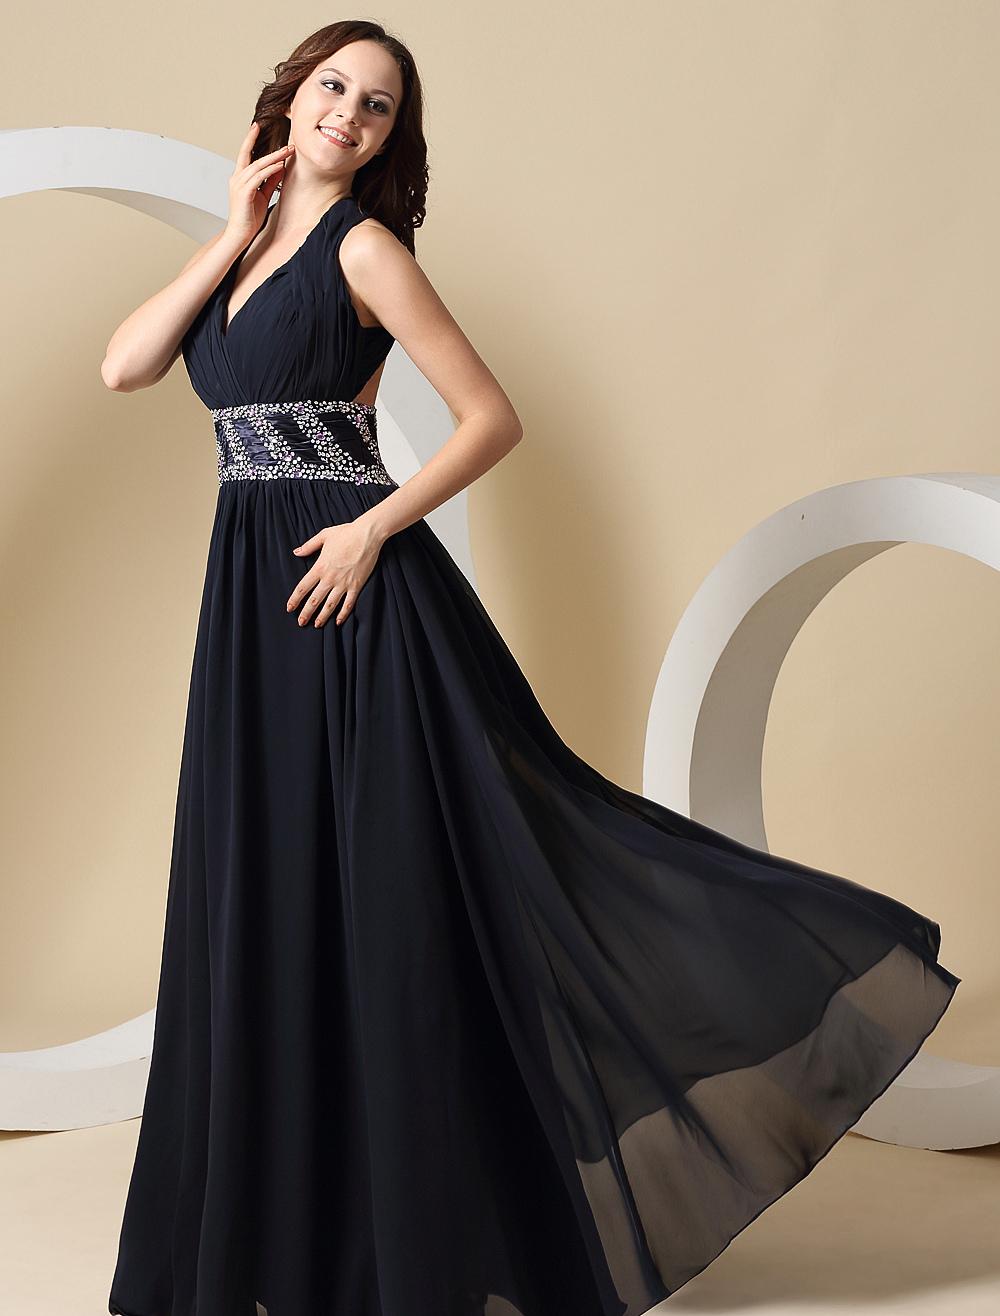 Elegant Deep Navy Blue Chiffon Halter A-line Prom Dress (Wedding Prom Dresses) photo